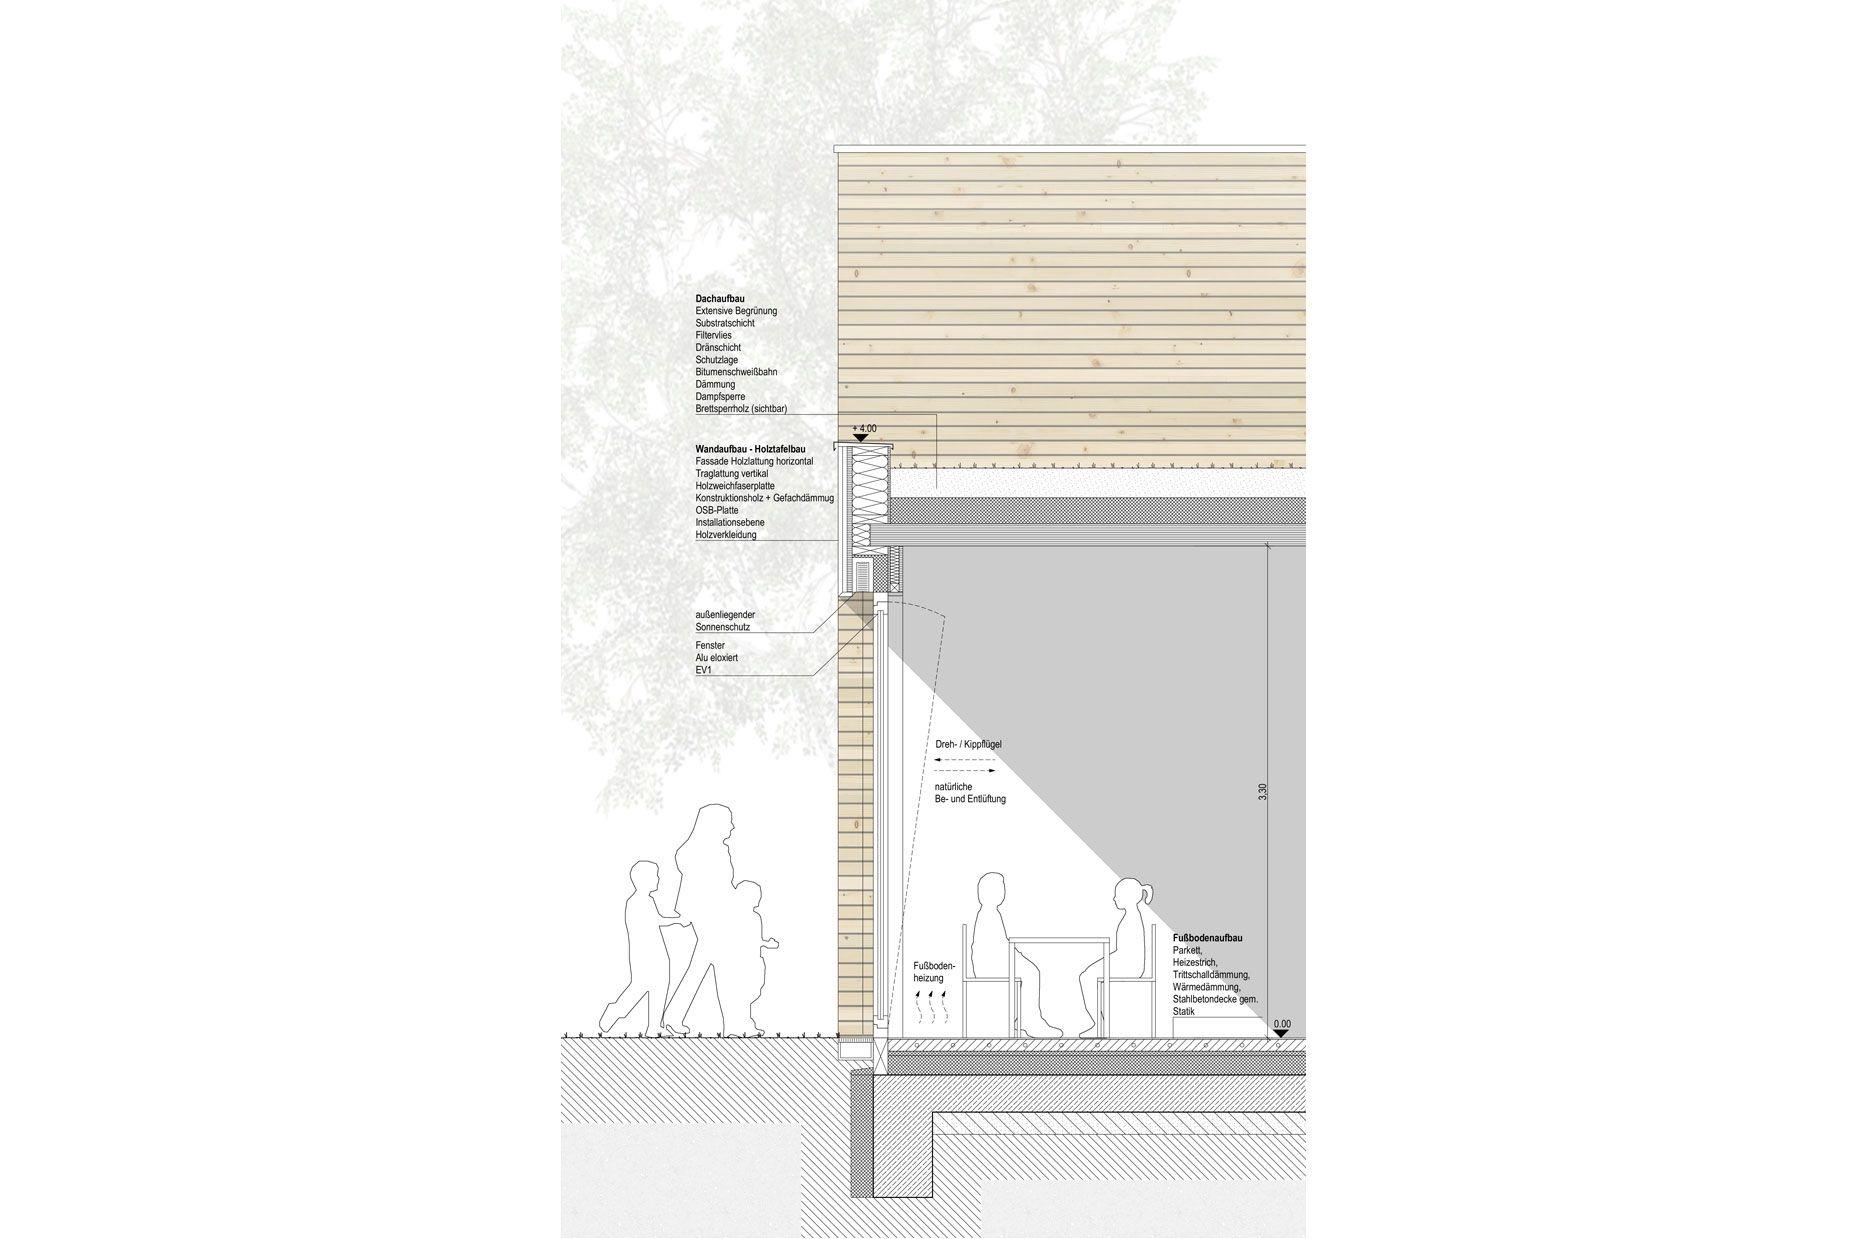 hkse_detail-2